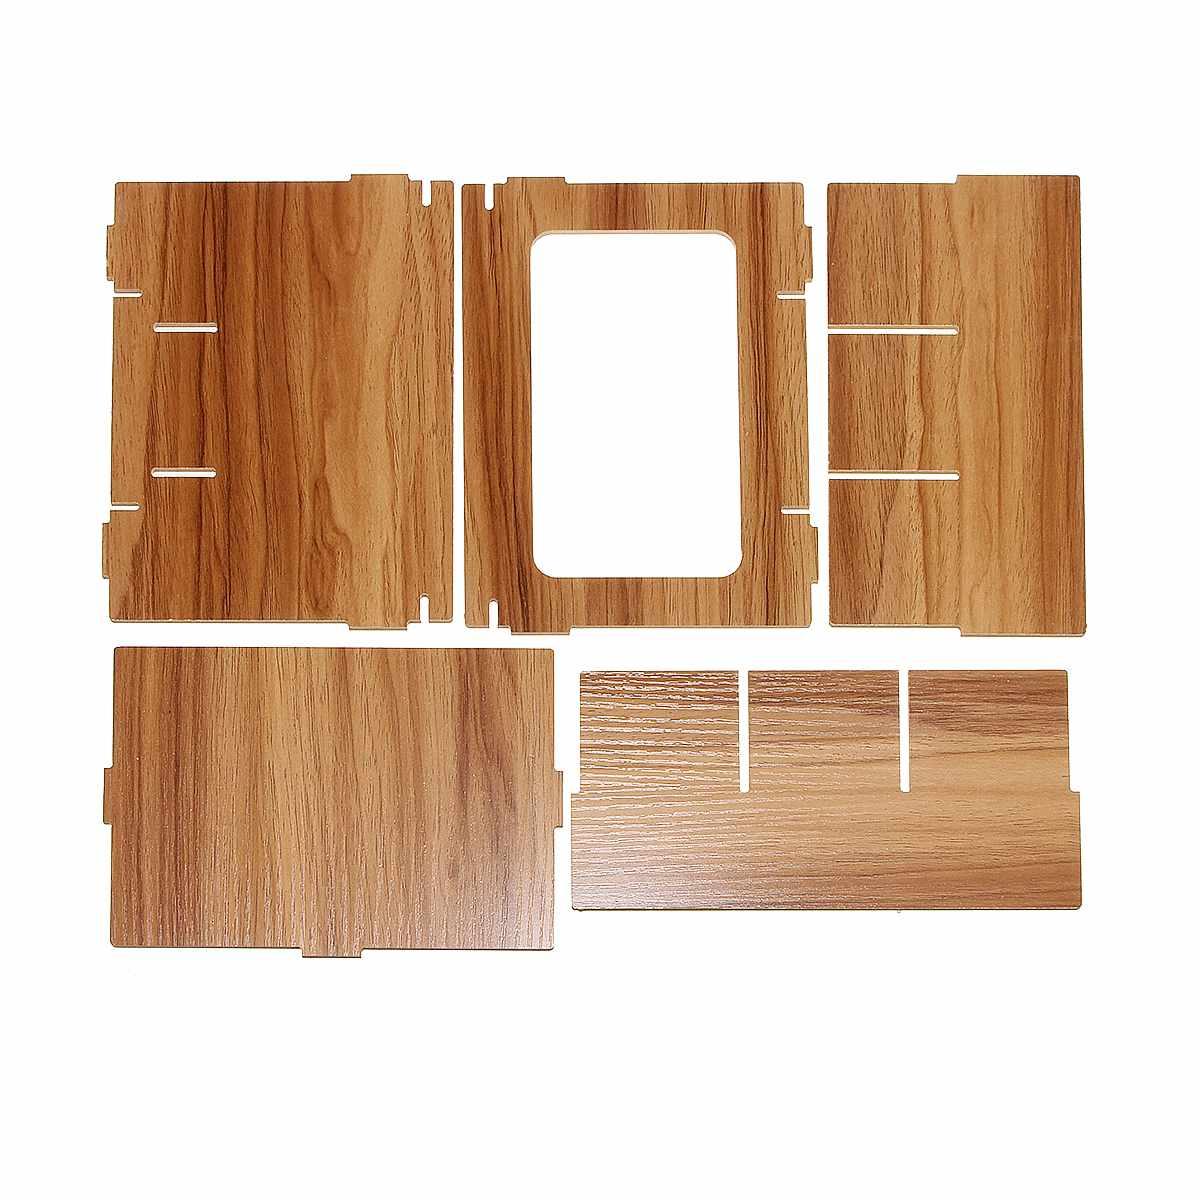 Titular da pena de madeira moda desktop